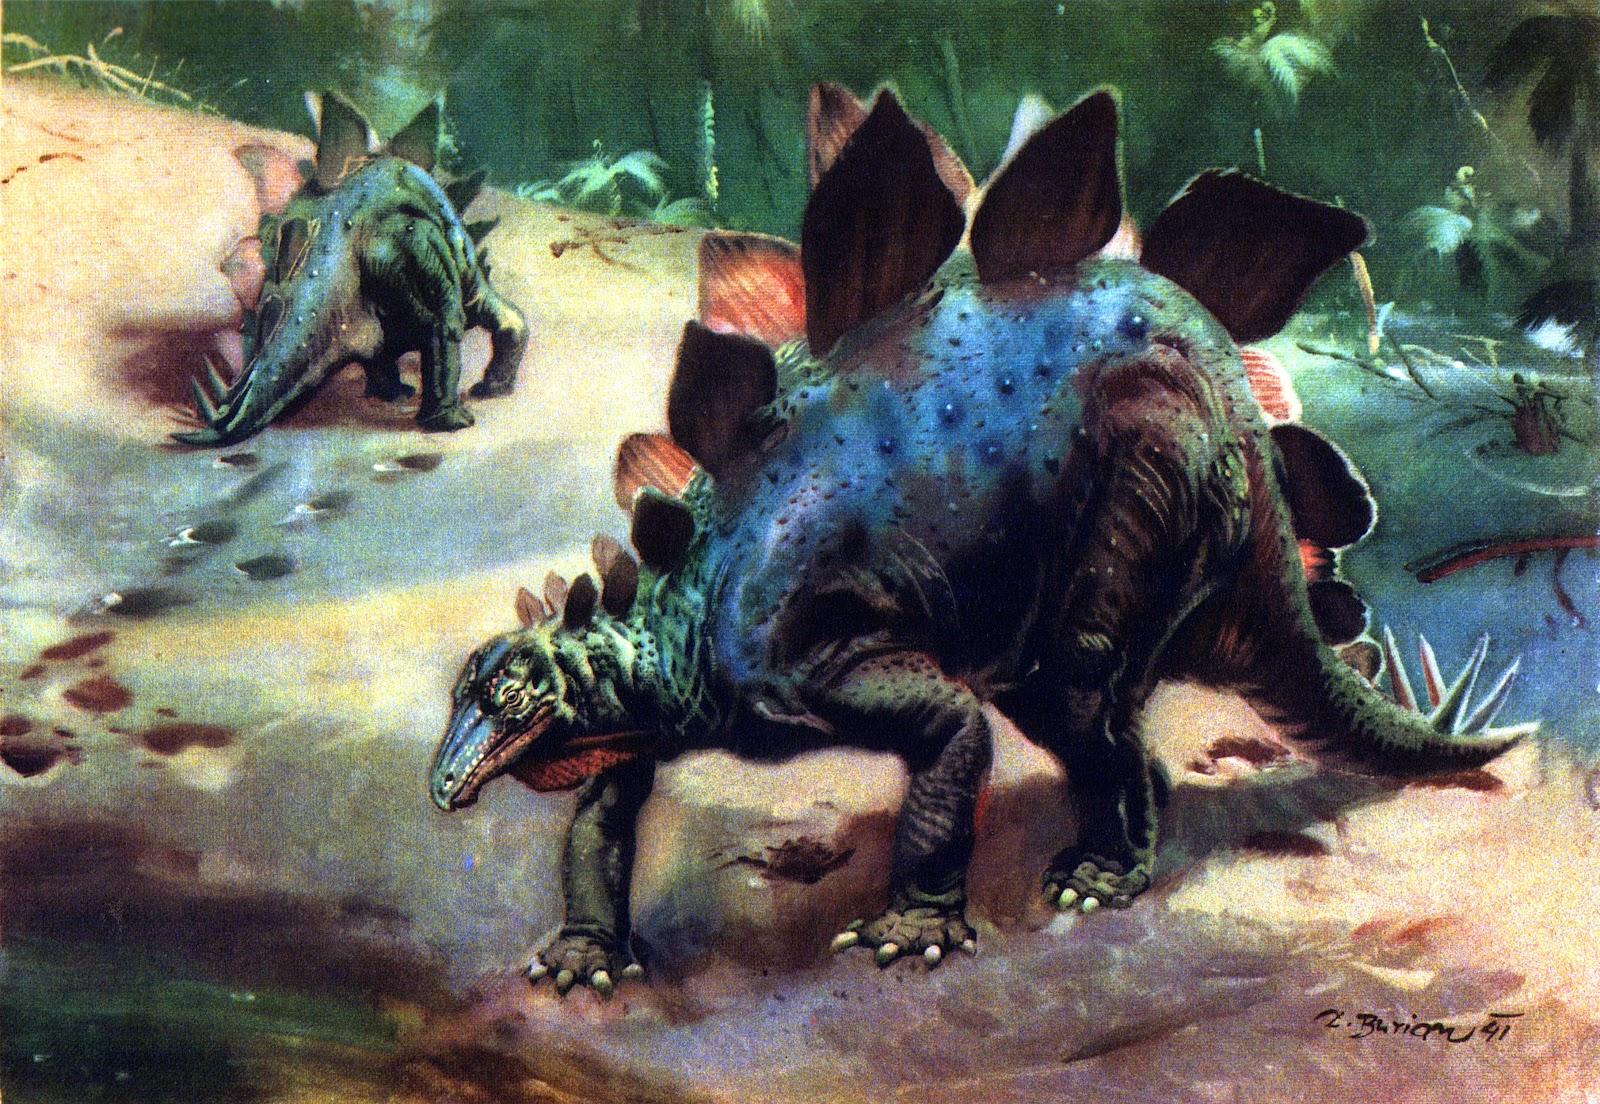 stegosaurus_by_zdenek_burian_1941JPG